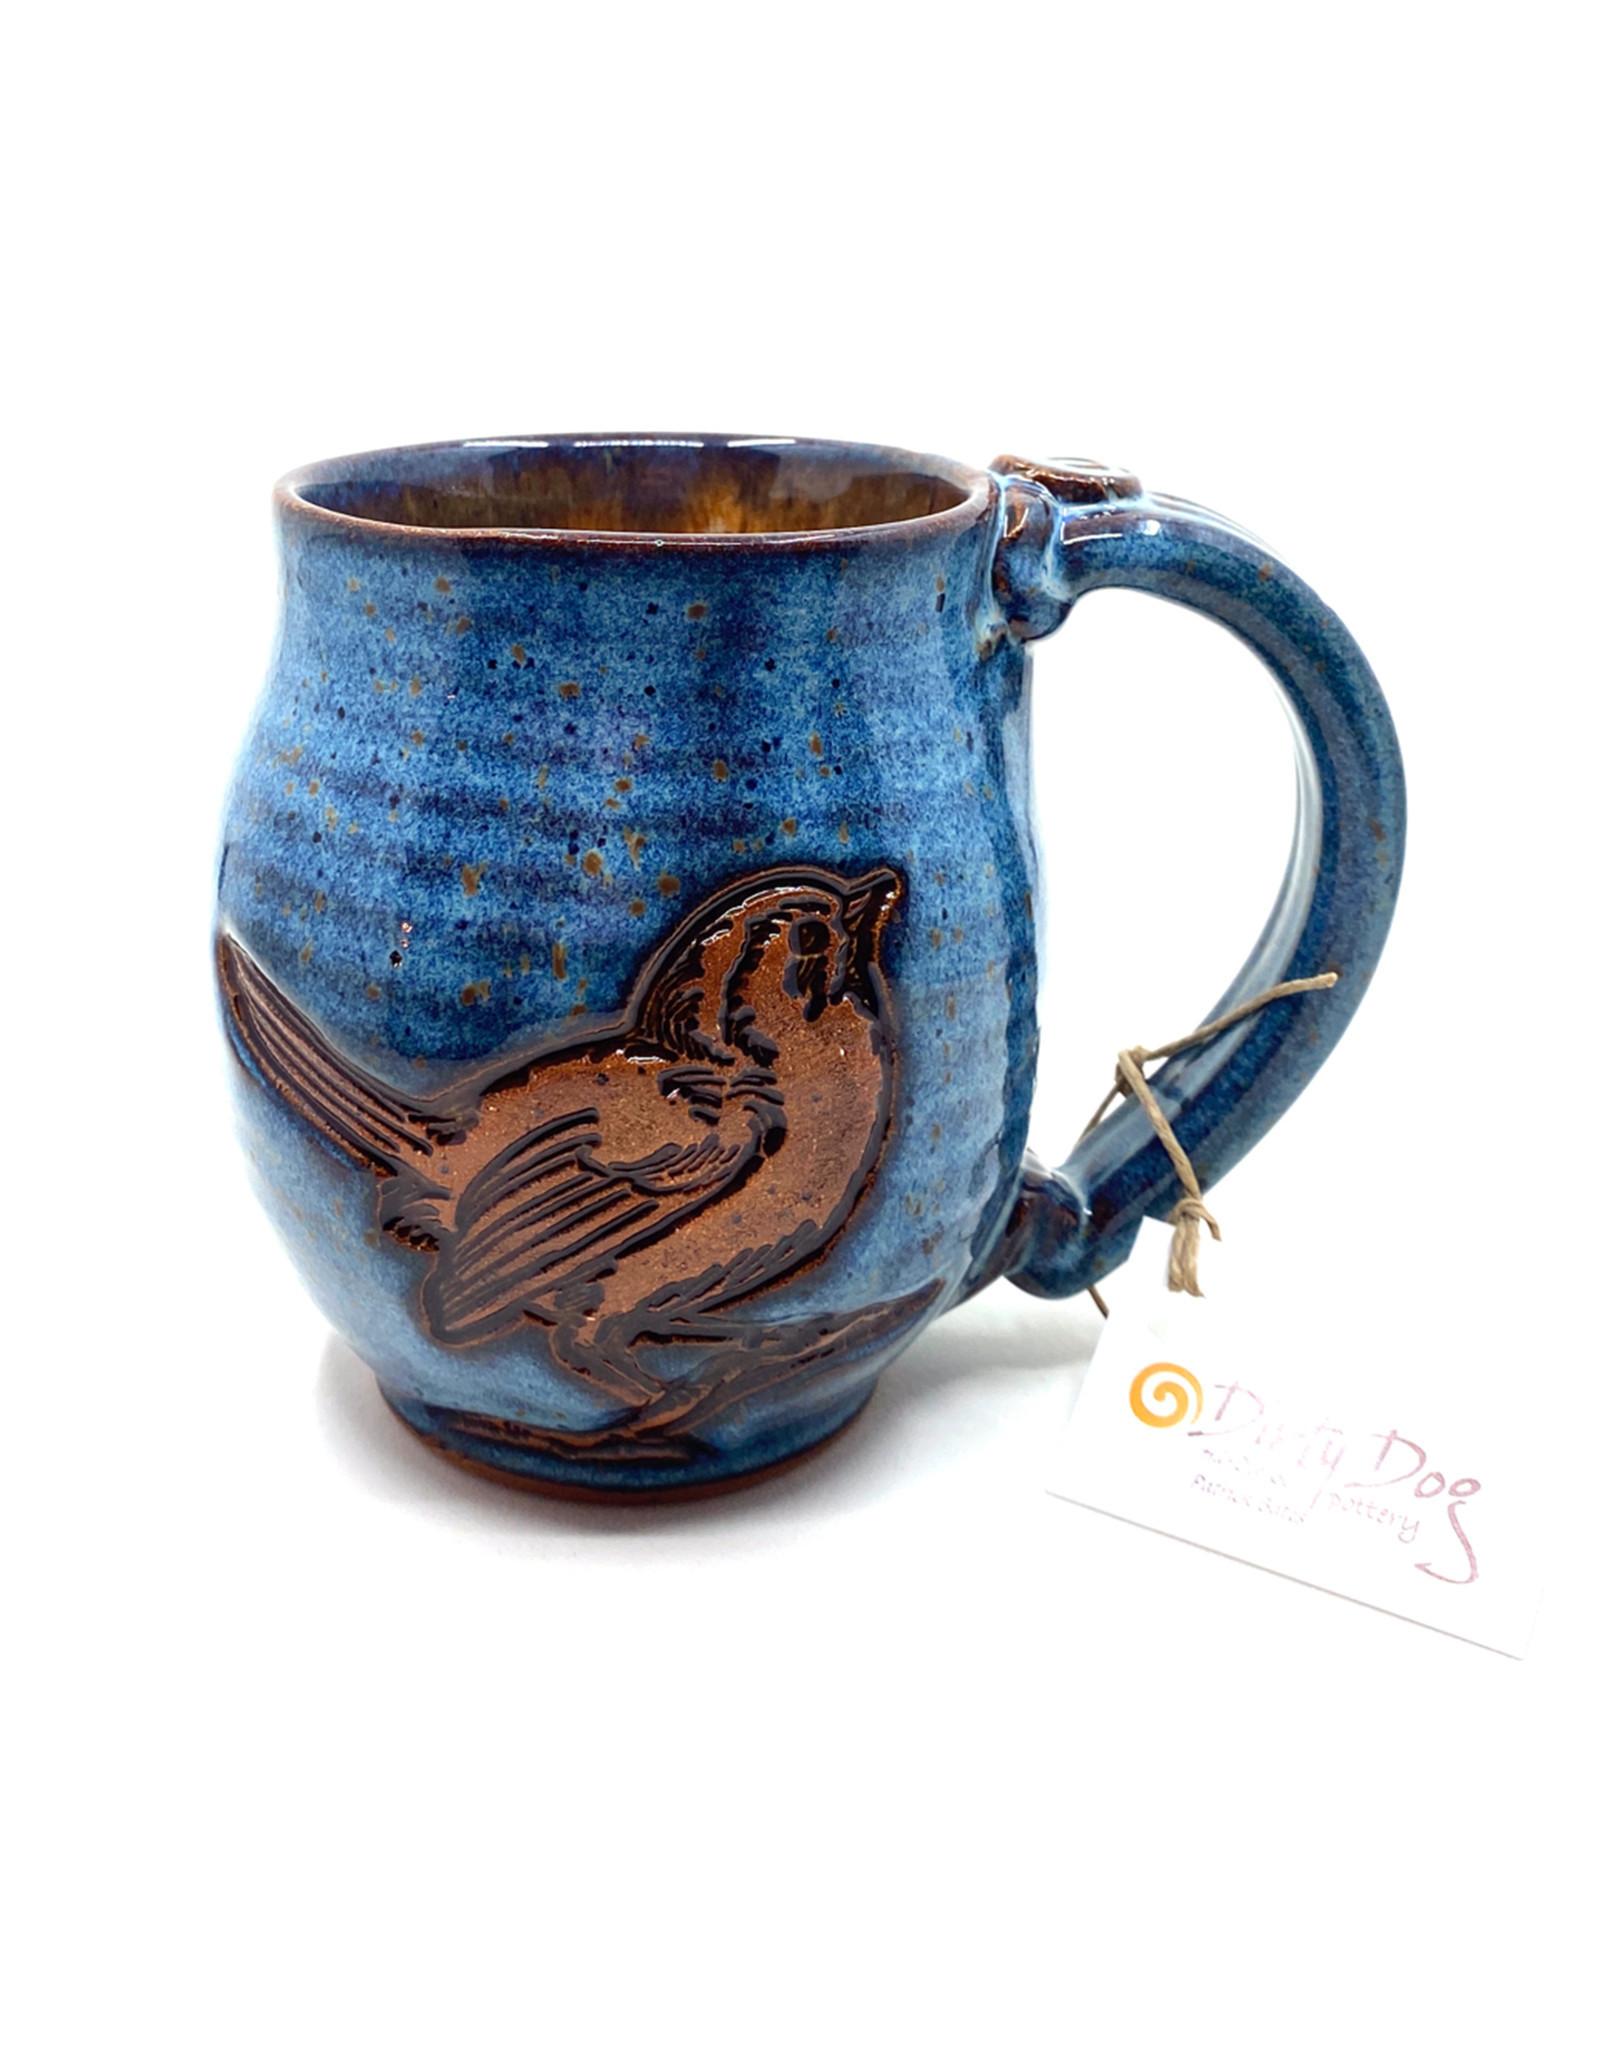 DIRTY DOG POTTERY BLUE BIRD MUG